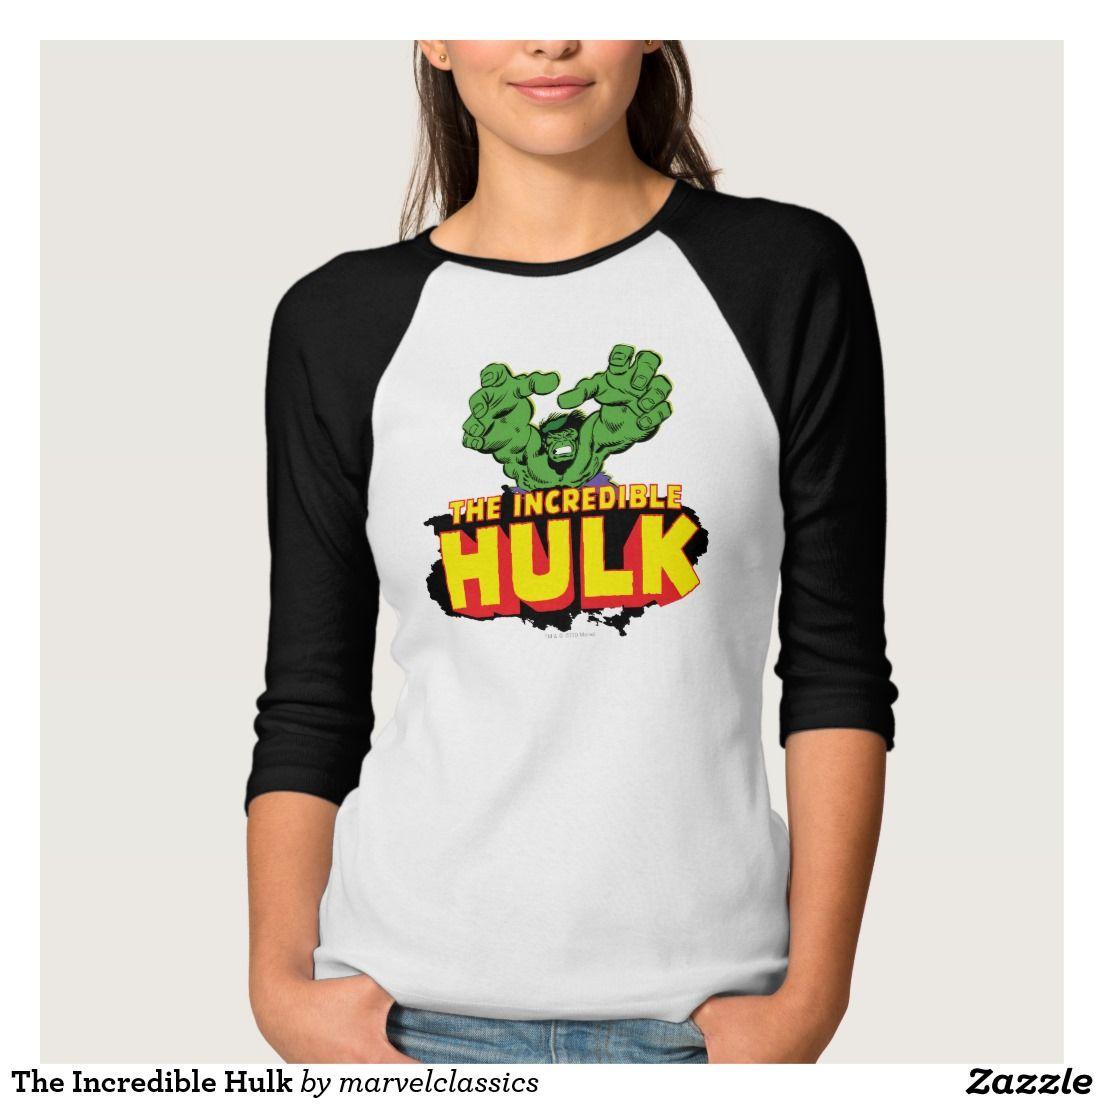 The Incredible Hulk T-shirt